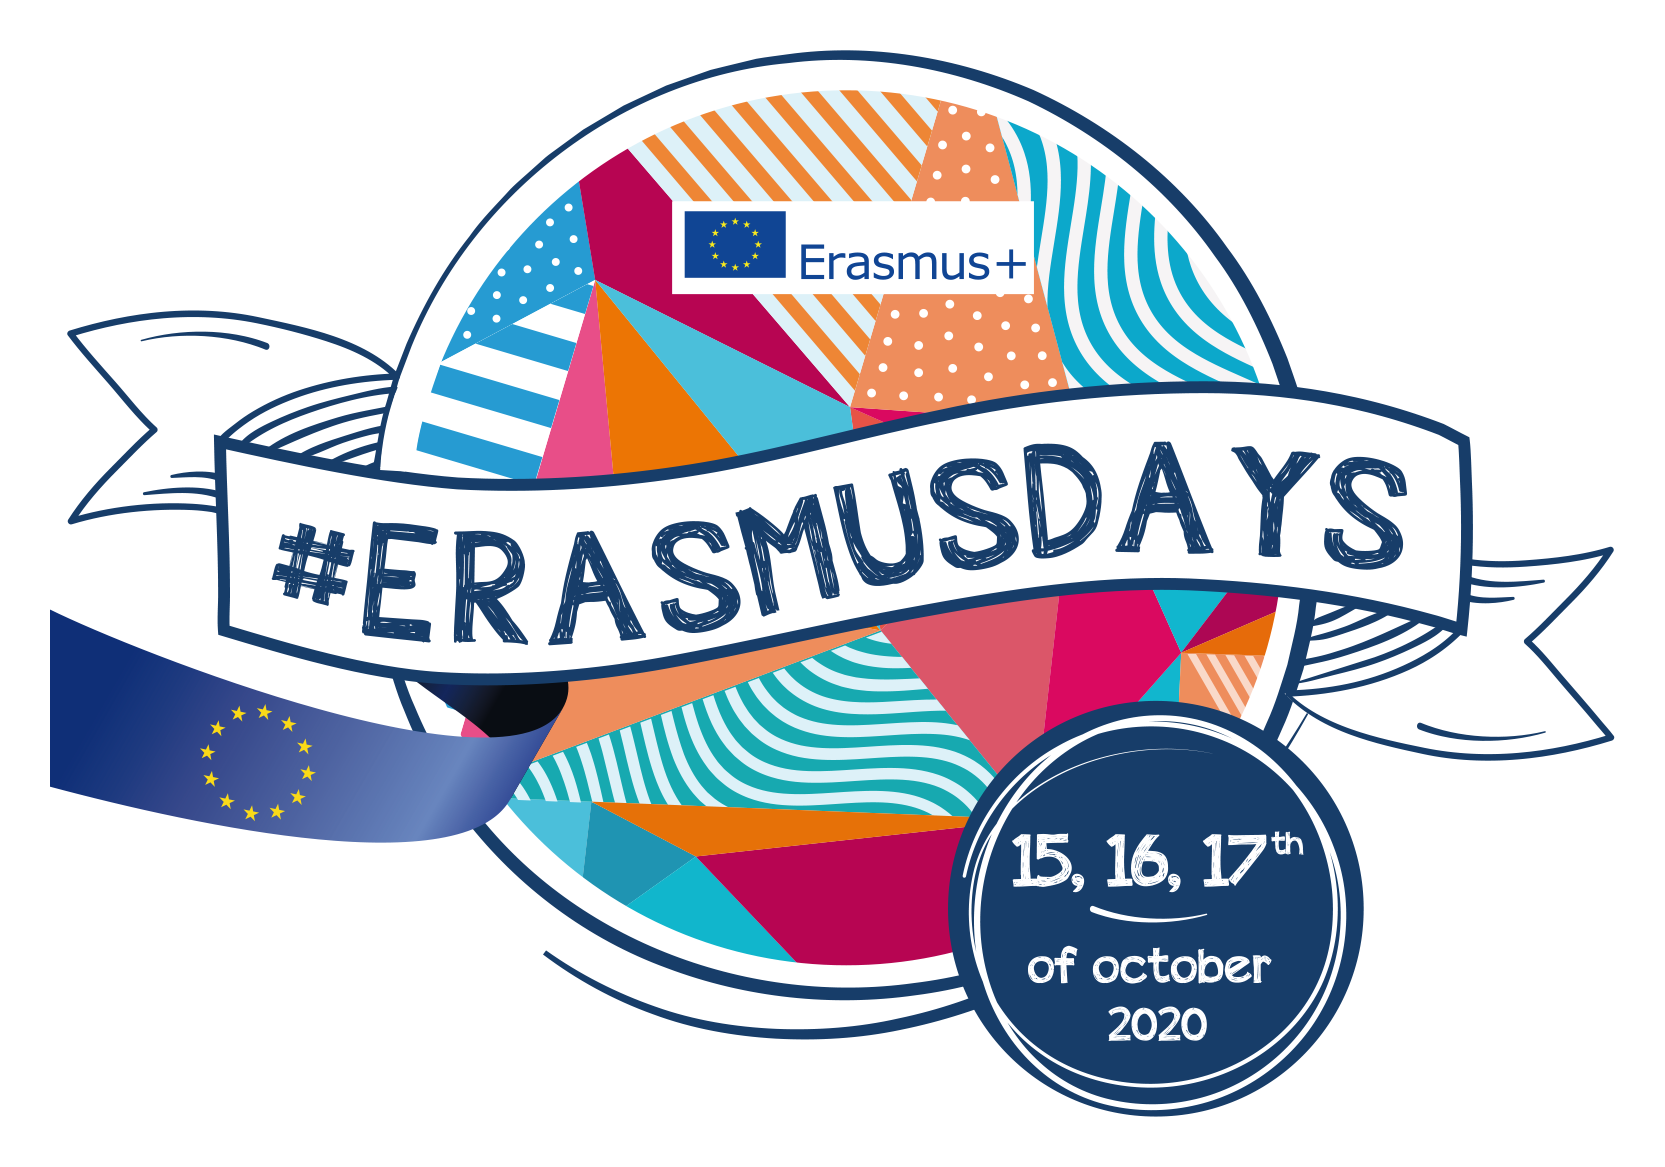 #ErasmusDay